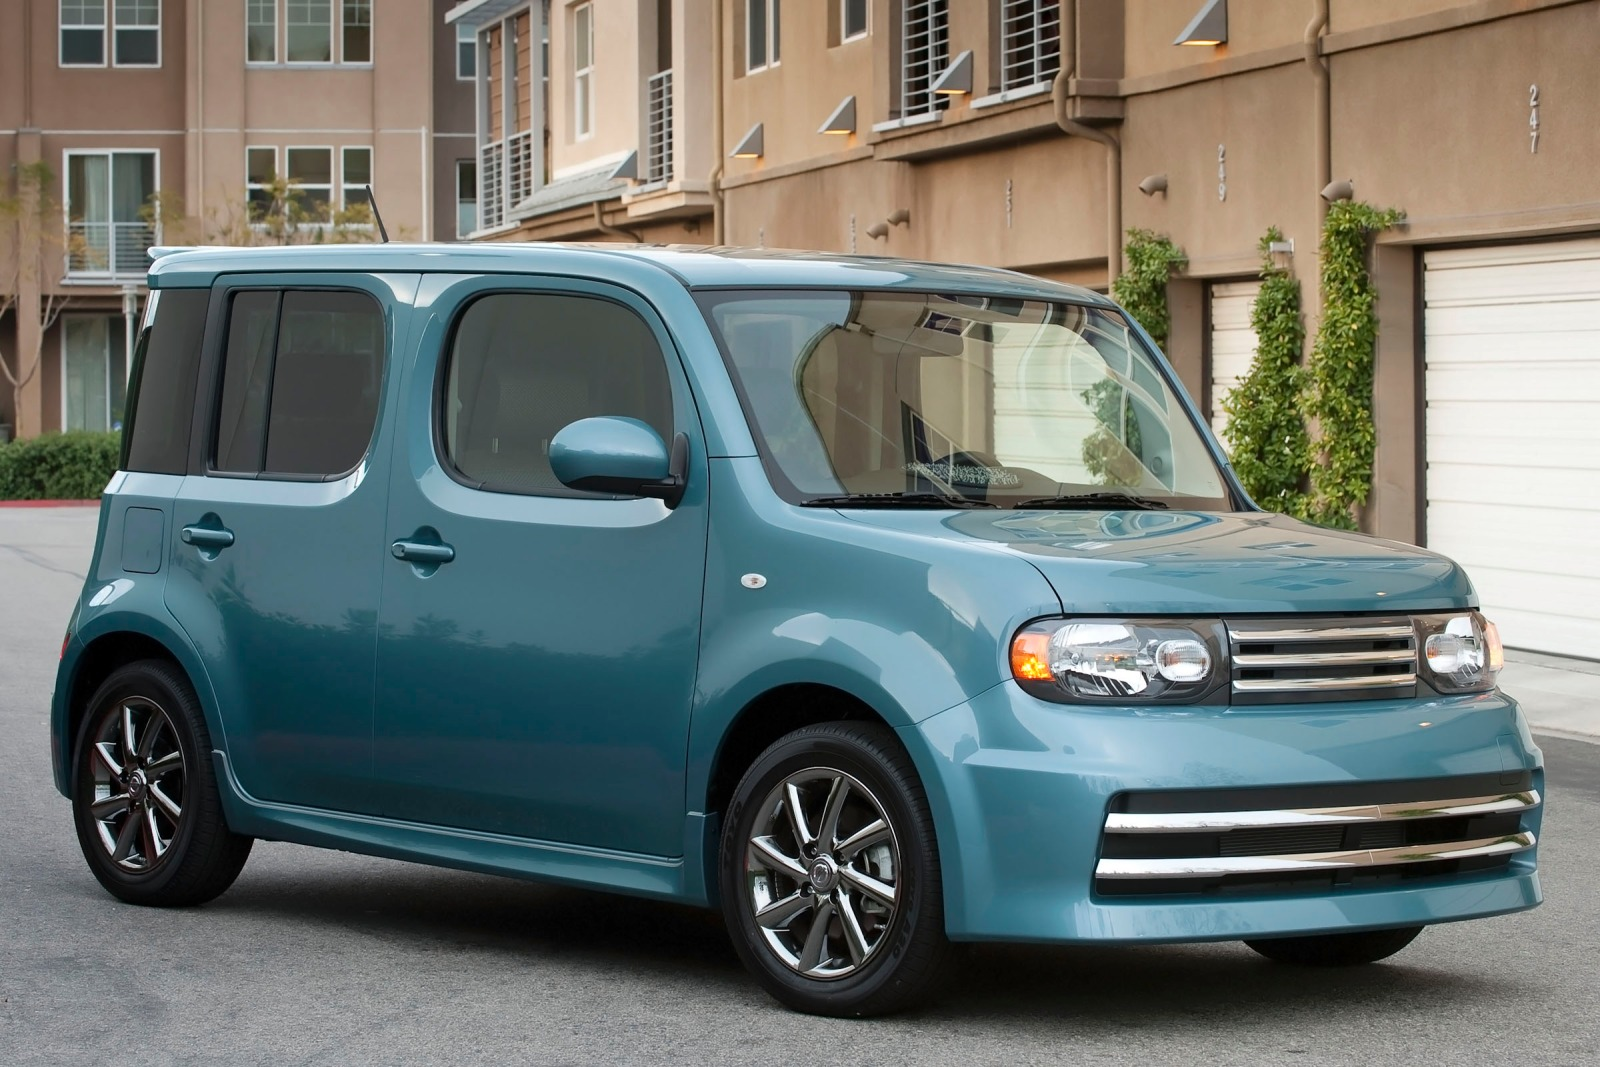 2012 nissan cube wagon 18 sl fq oem 3 1600